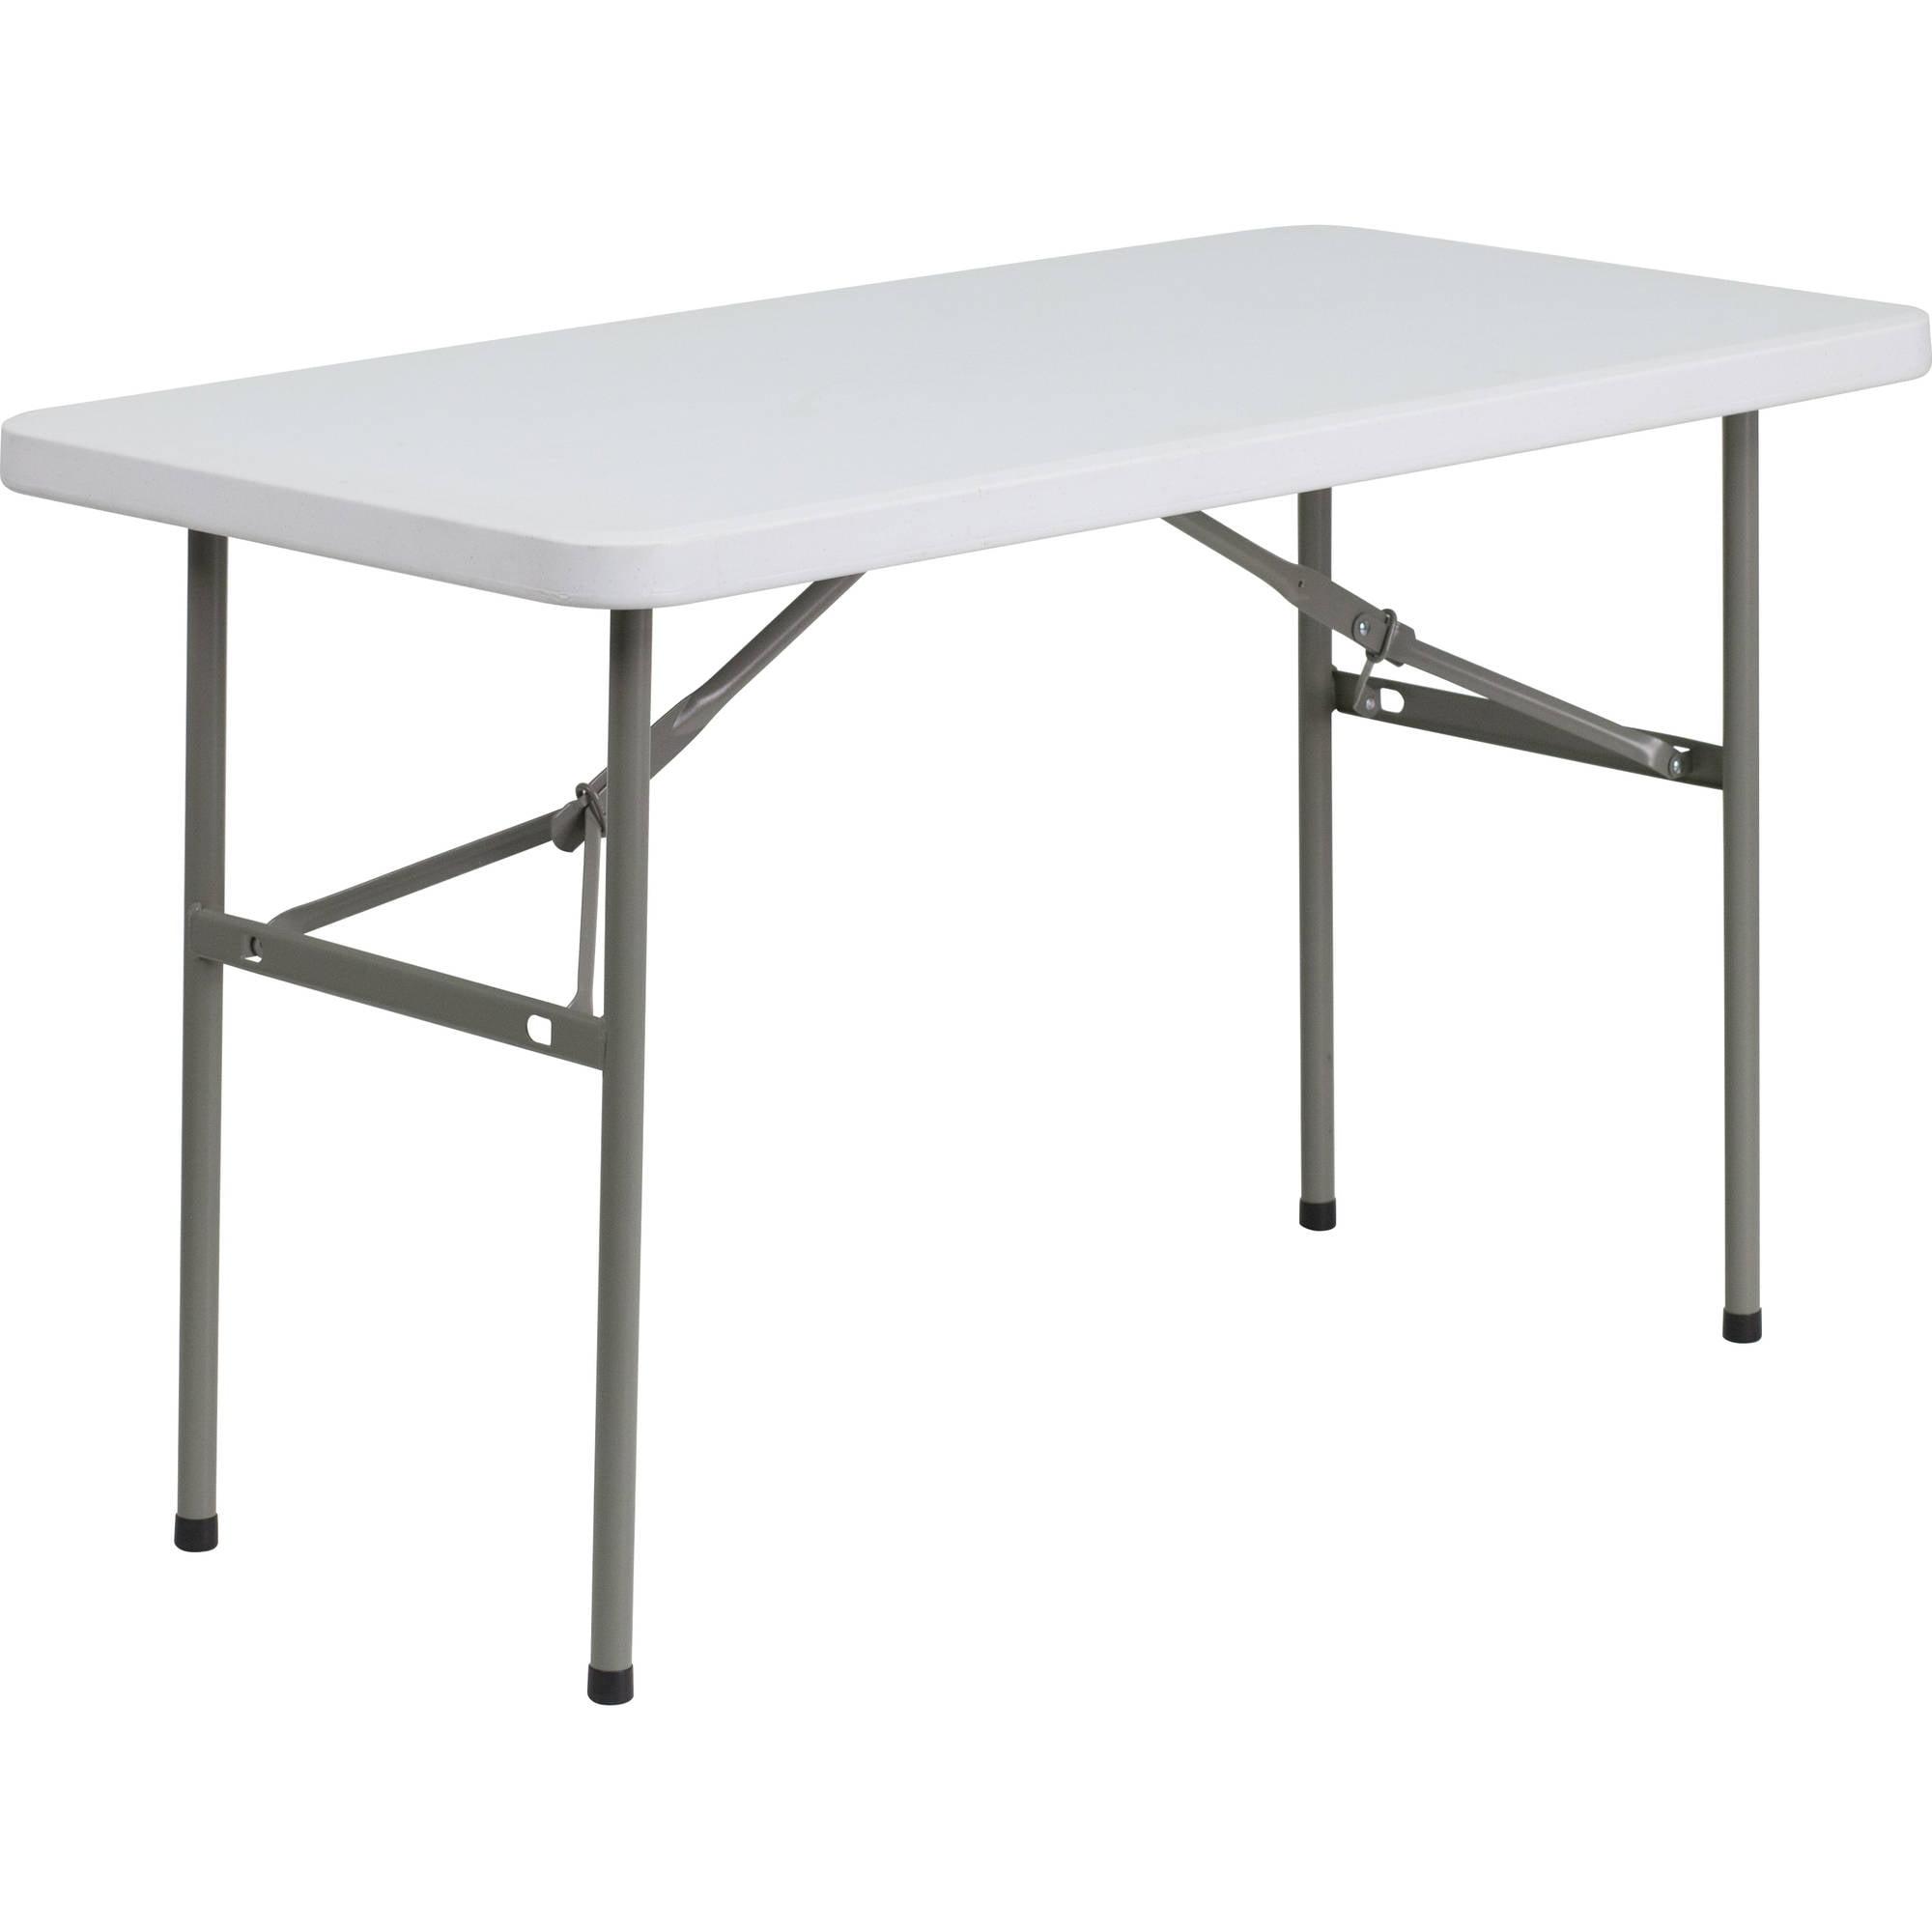 Flash Furniture 24''W x 48''L Granite White Plastic Folding Table by Flash Furniture